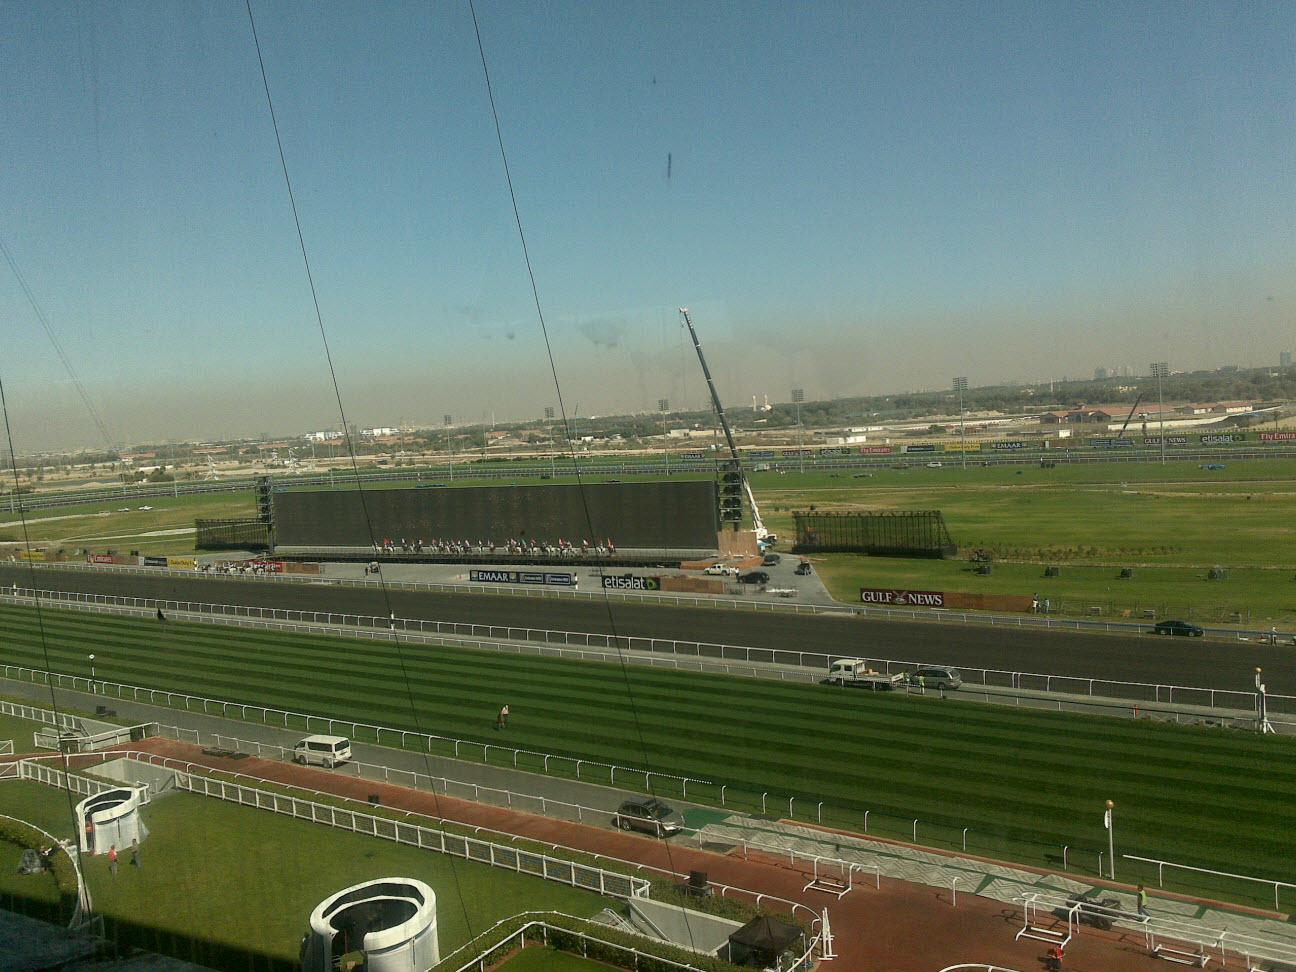 Dubai Horse Race 2011 (7)